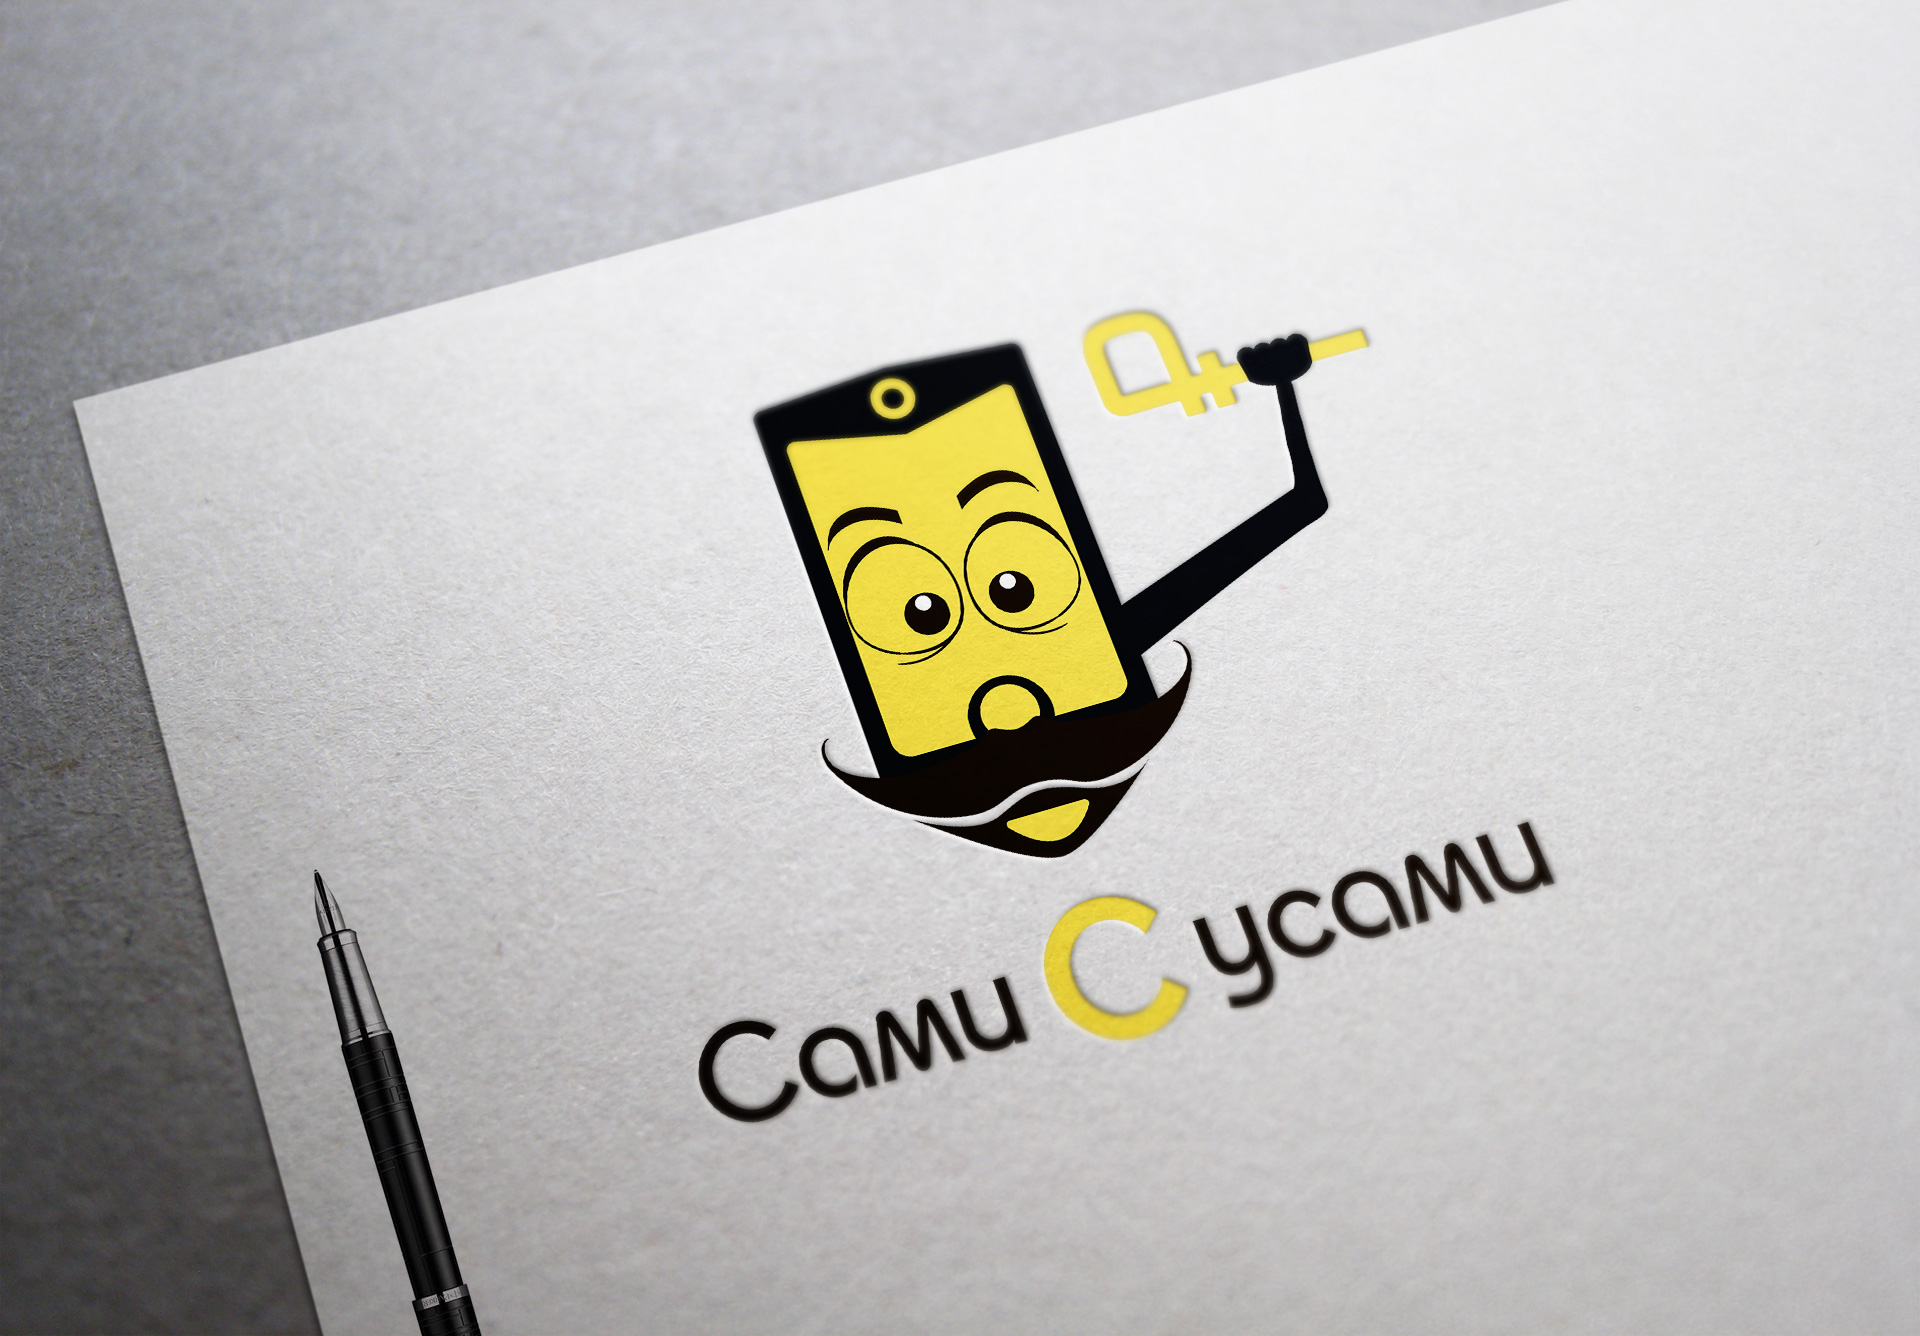 Разработка Логотипа 6 000 руб. фото f_13458f7b9426dd1a.jpg